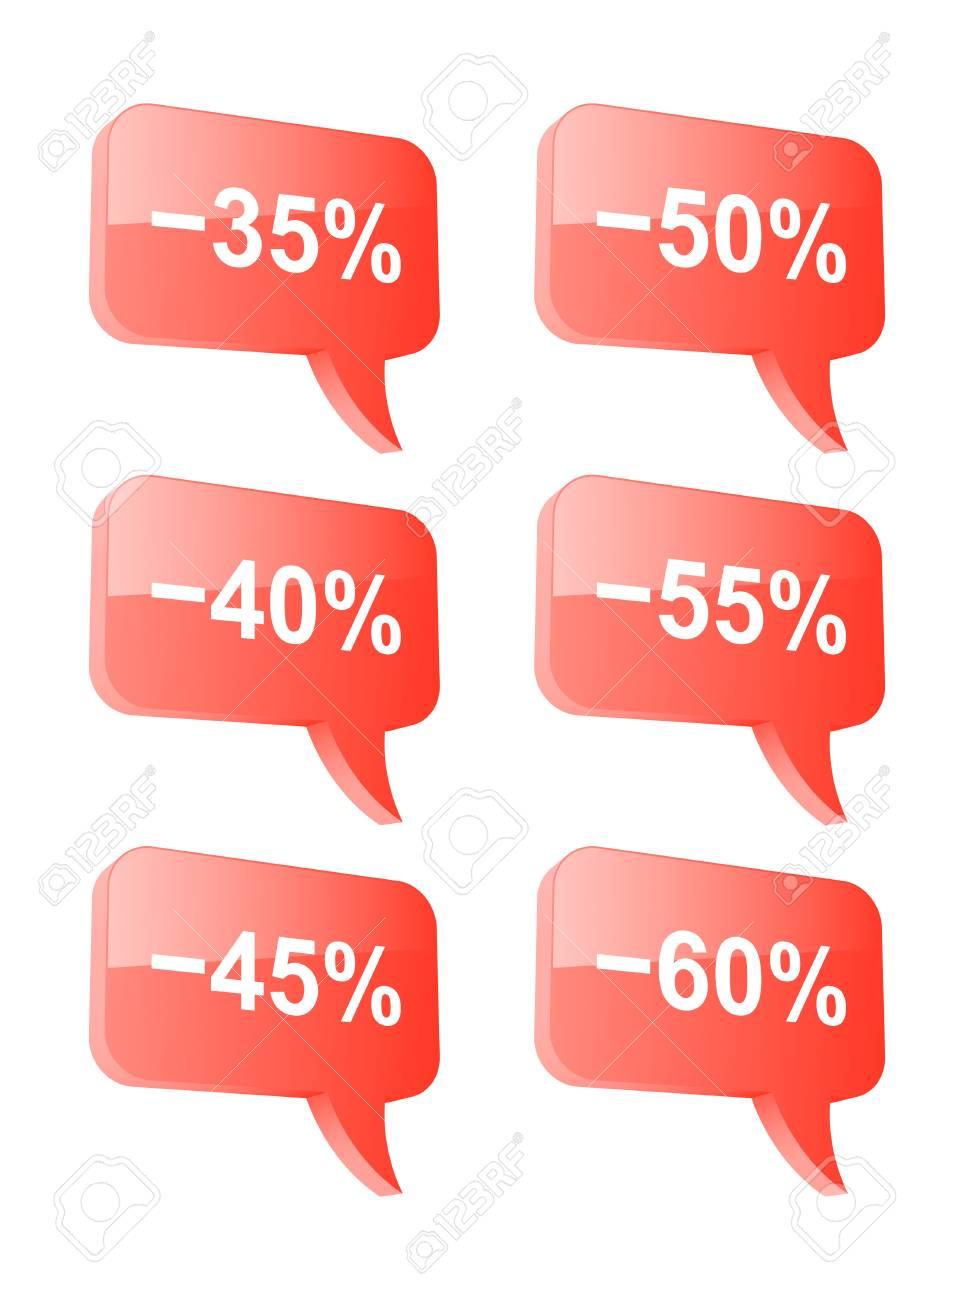 Discount speech bubbles  Part two  illustration Stock Vector - 18732971